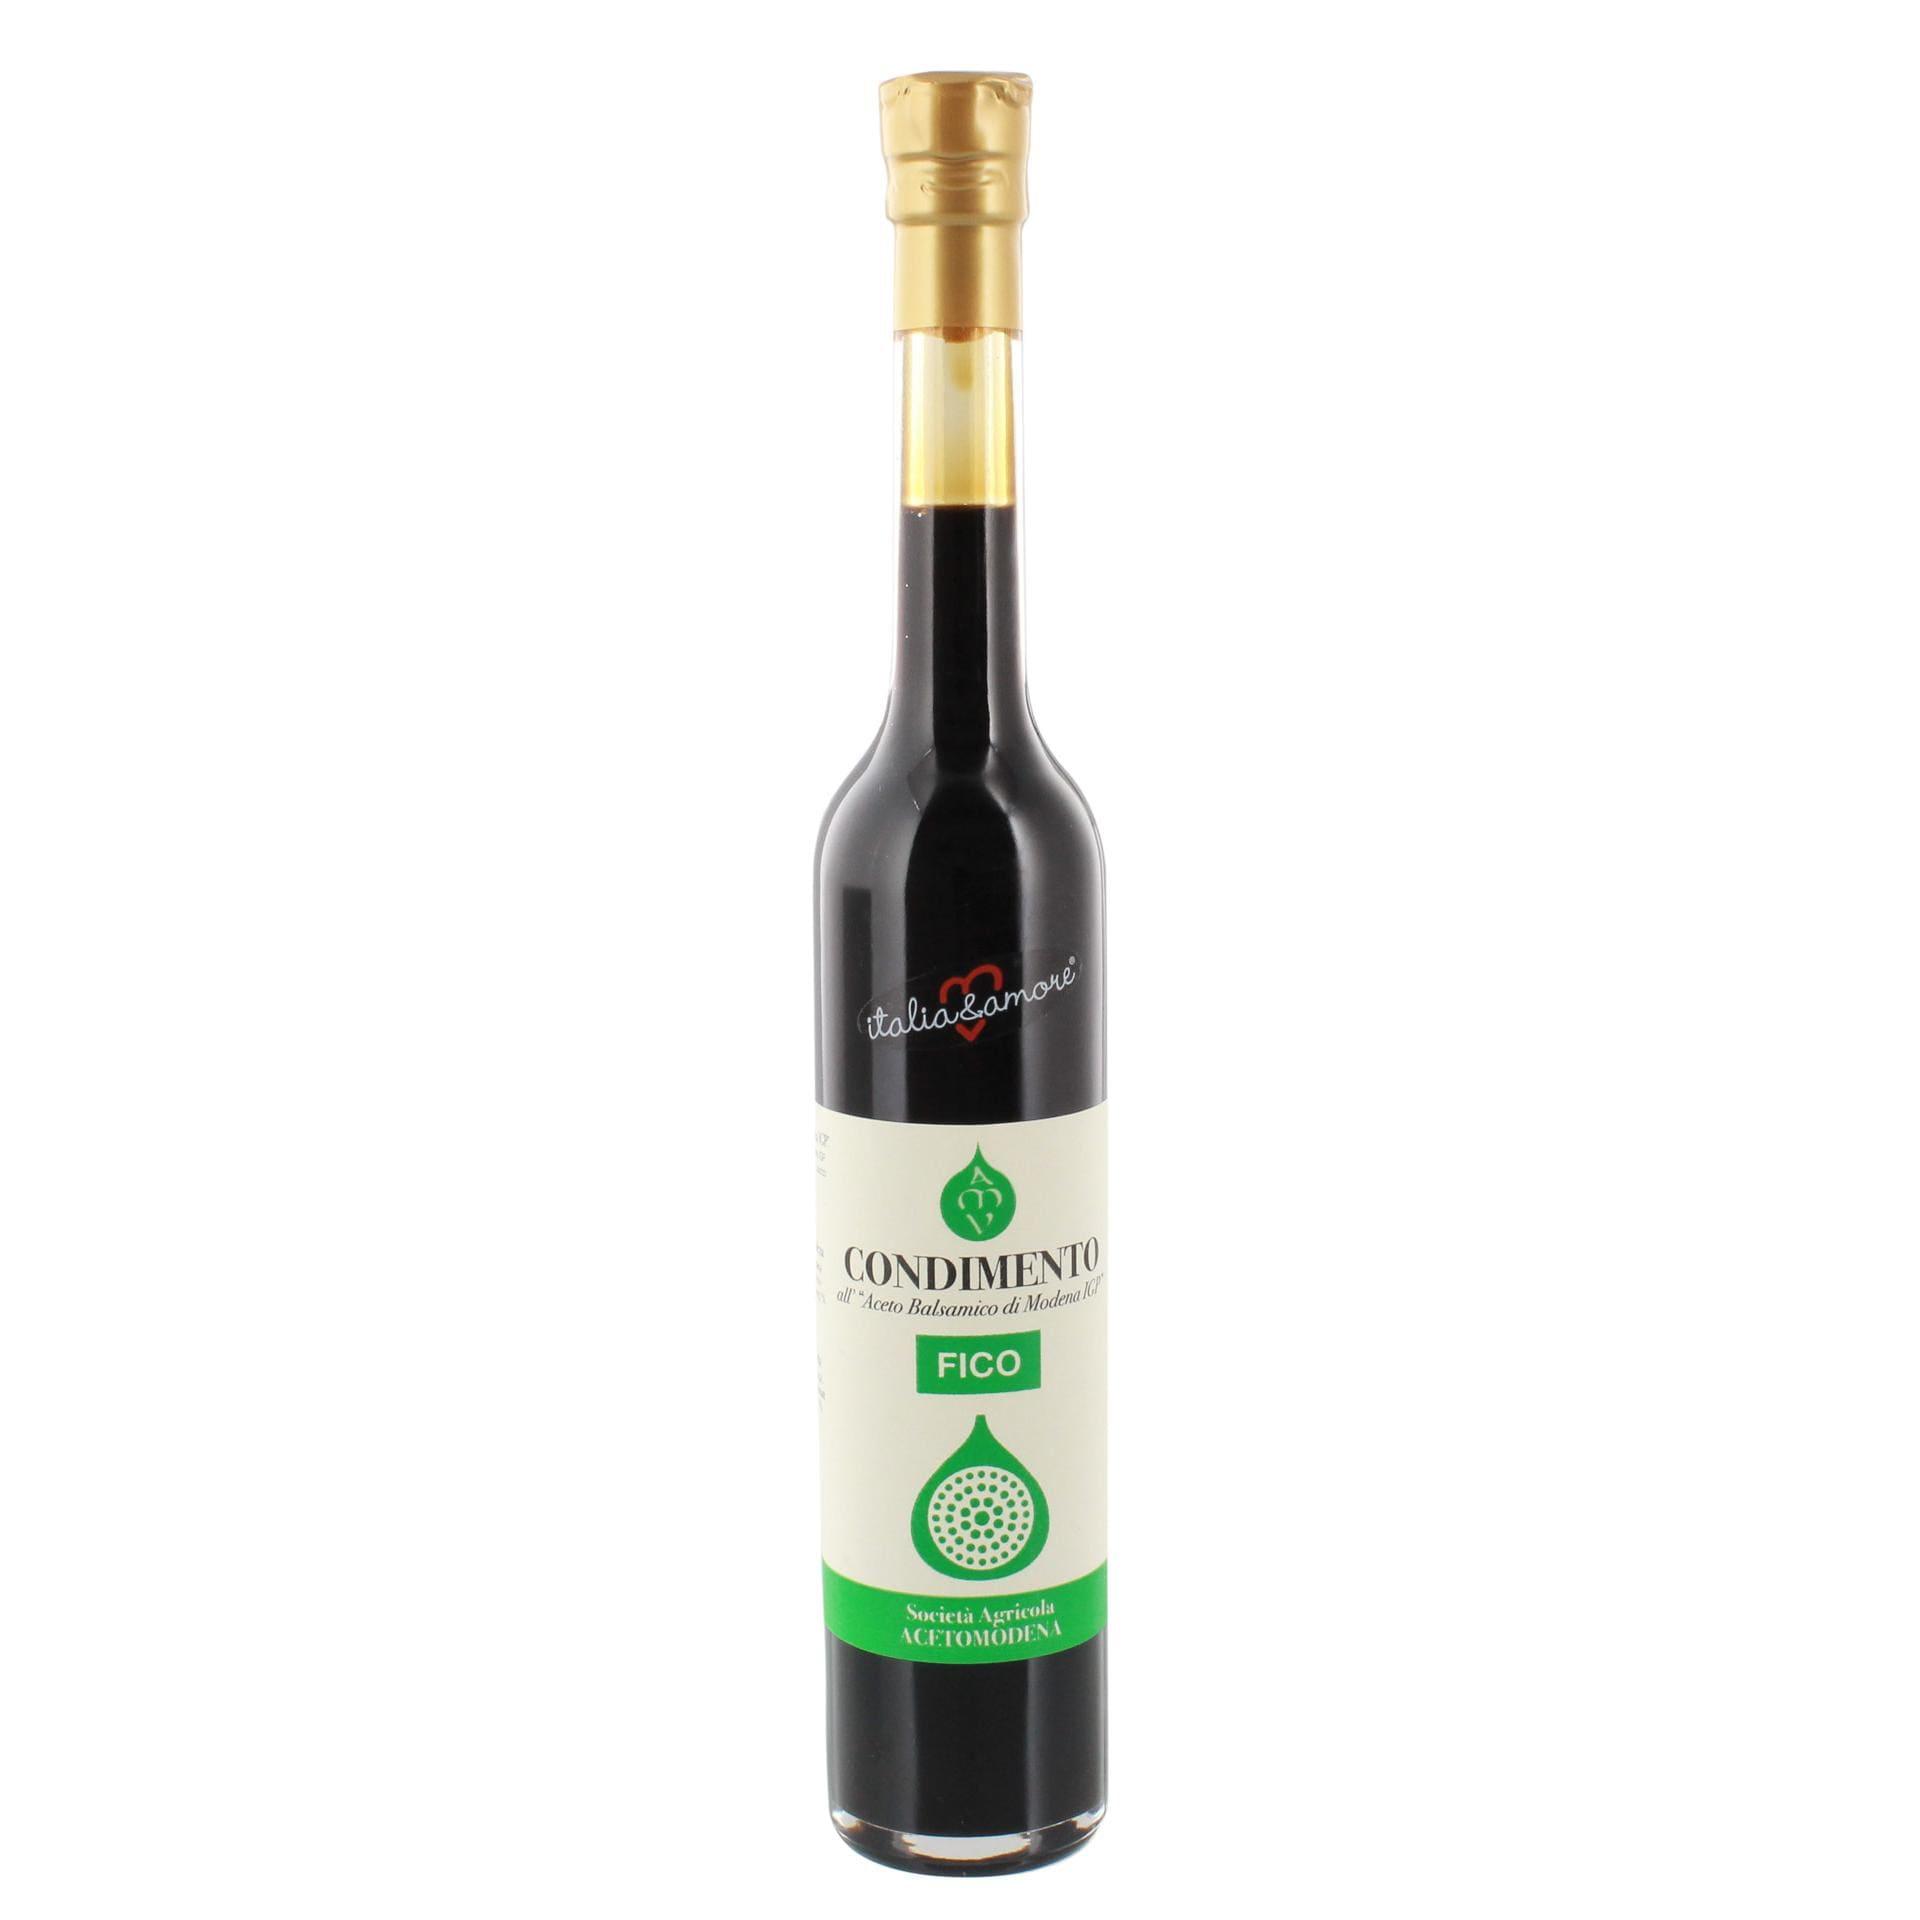 italia & amore - Condimento all Aceto Balsamico Gewürz Feige - 100ml